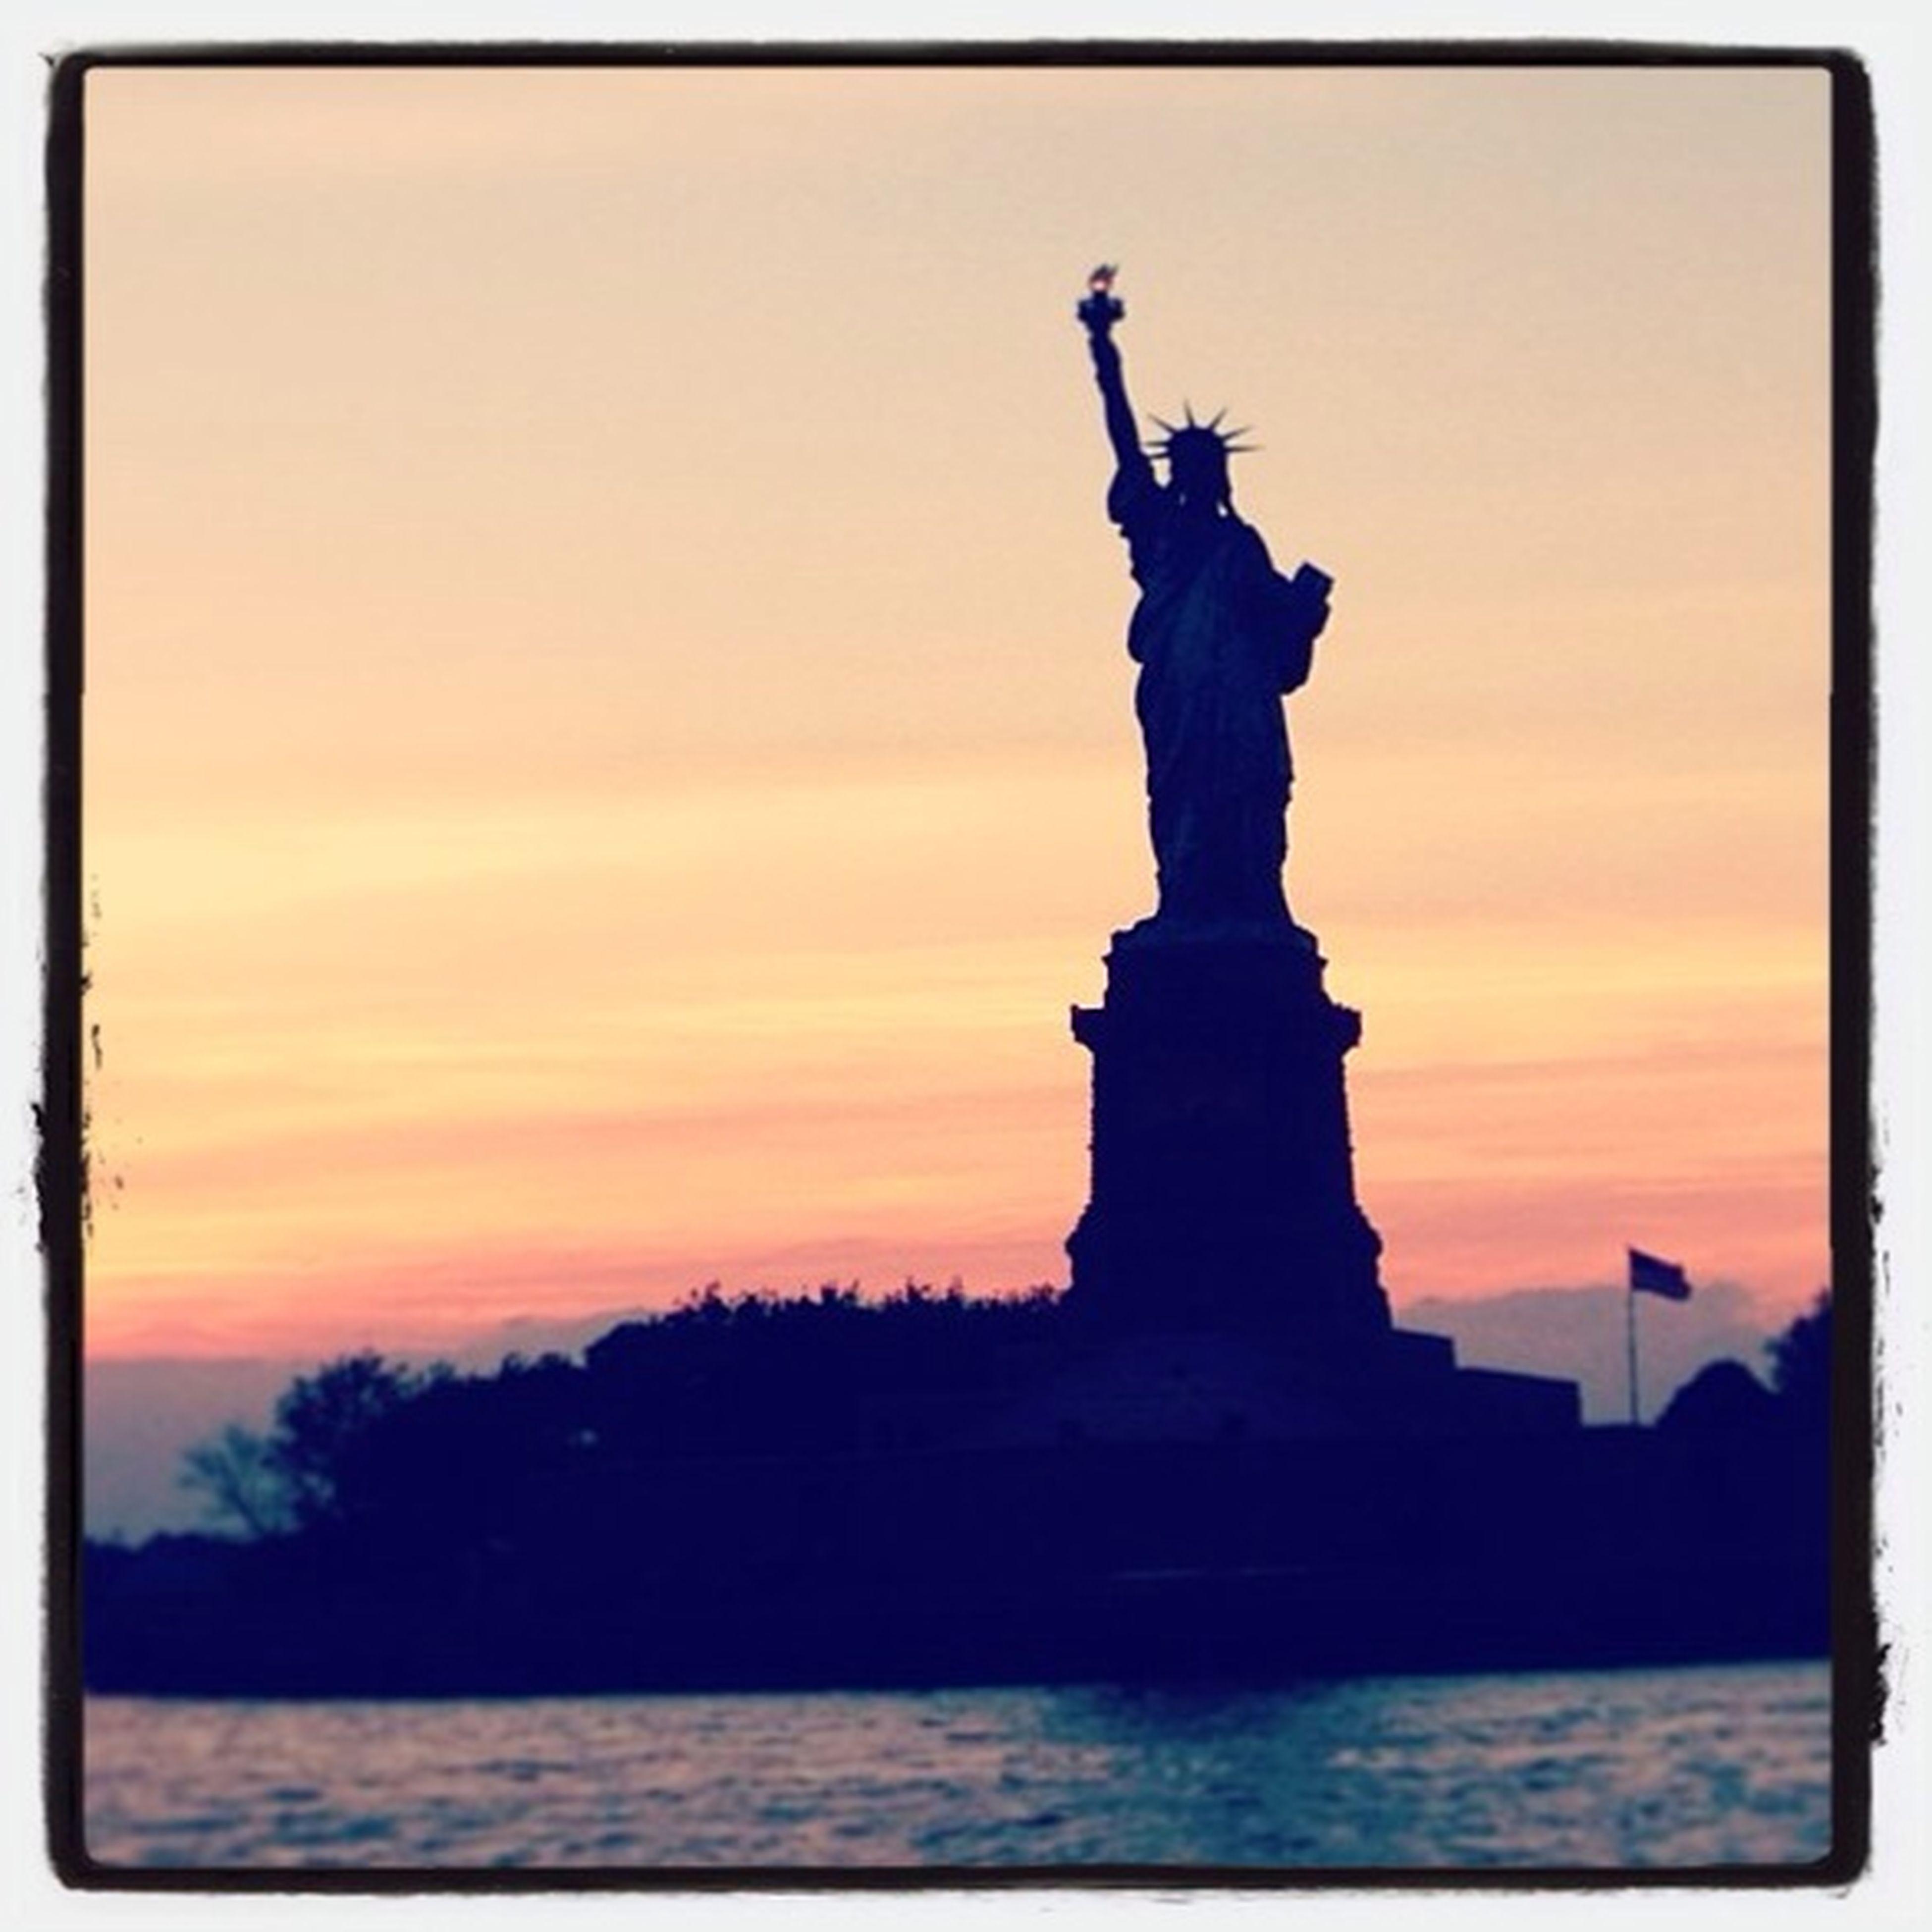 statue, sunset, human representation, sculpture, art and craft, art, creativity, transfer print, silhouette, sky, orange color, famous place, architecture, travel destinations, built structure, religion, auto post production filter, travel